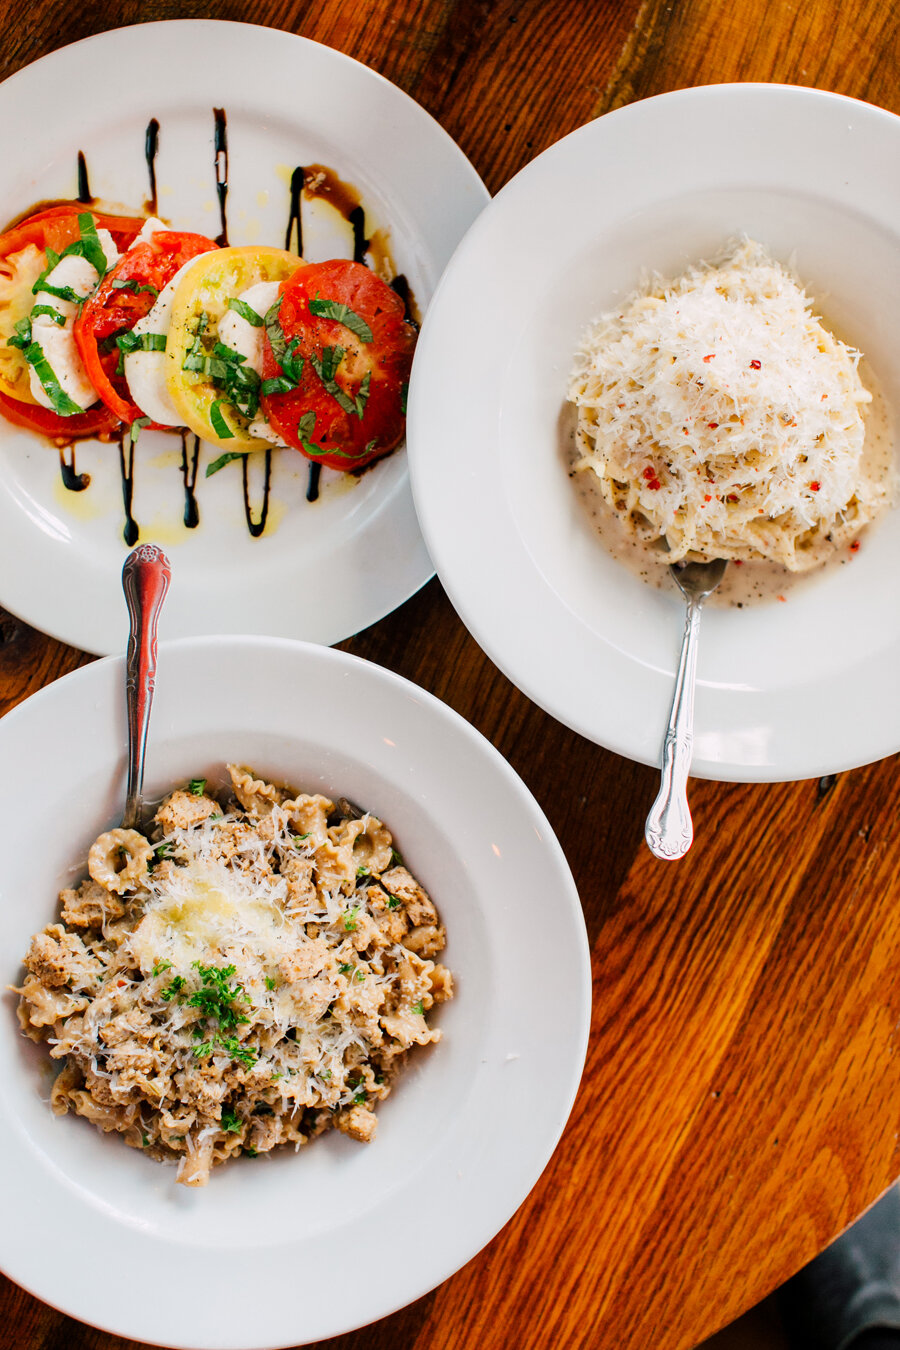 023-Seattle-food-photographer-katheryn-moran-due-cucina-italiana-pasta.jpg